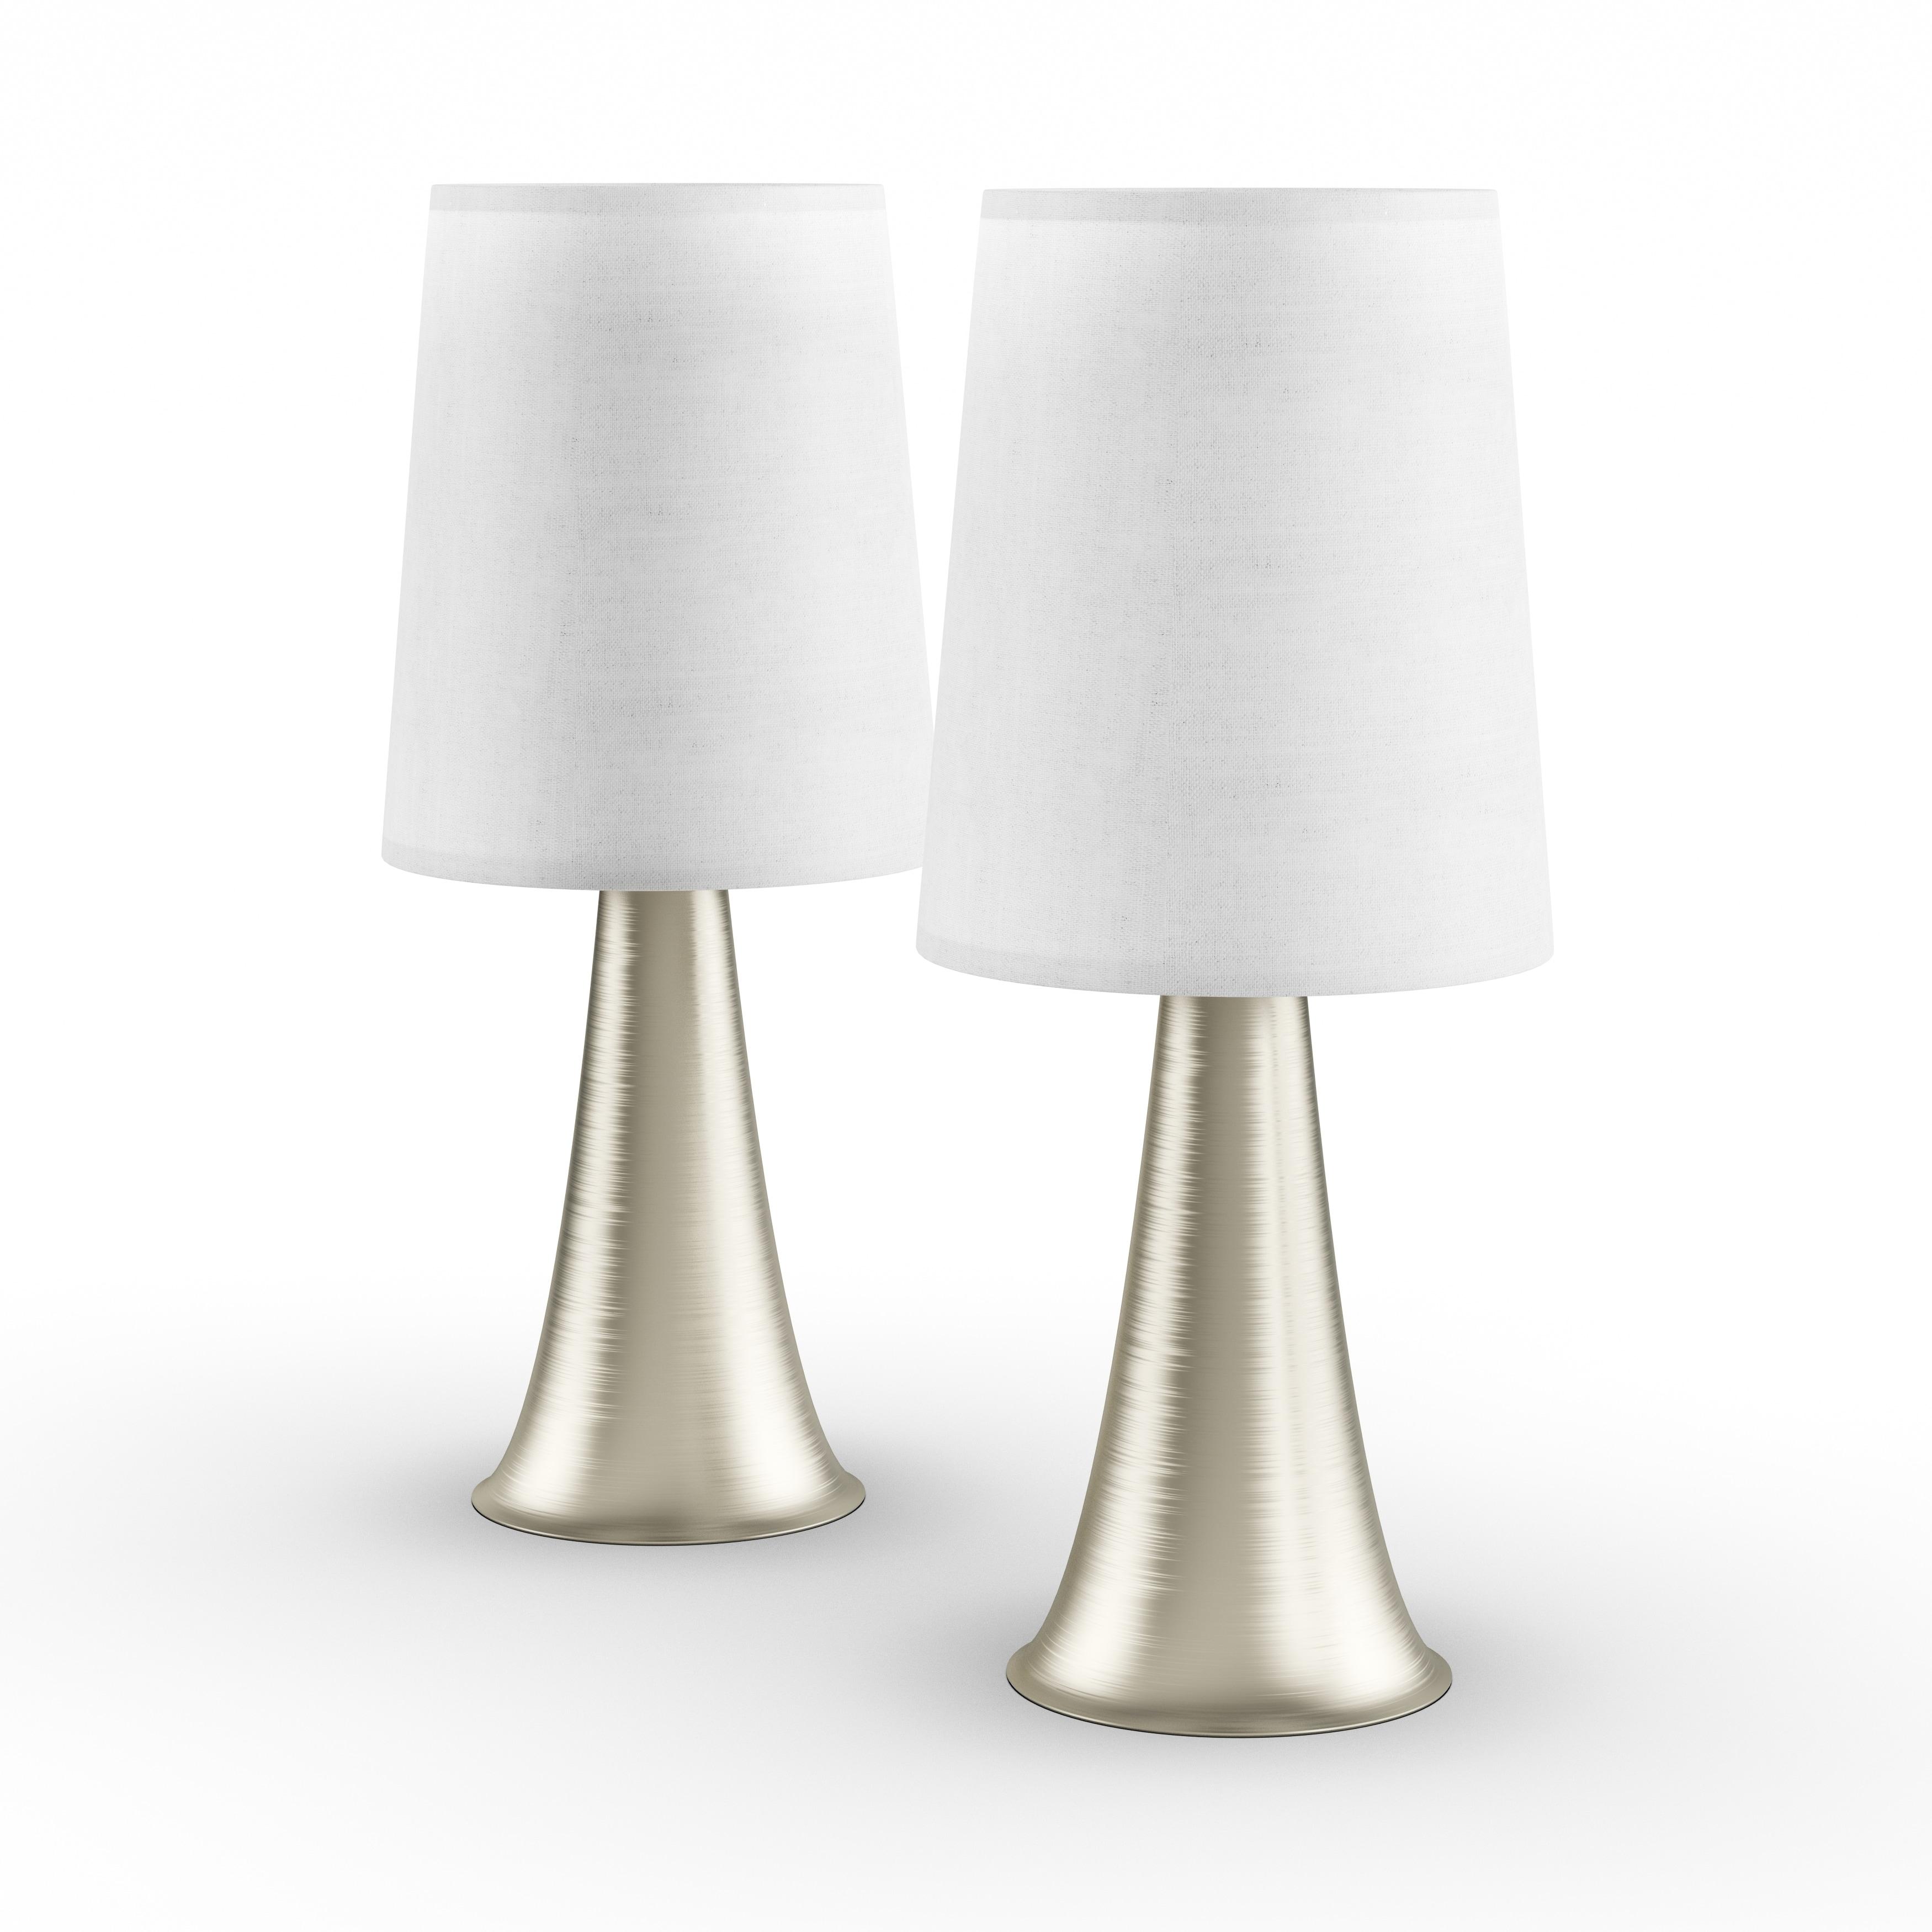 shop porch den delano st clair mini touch table lamp set with